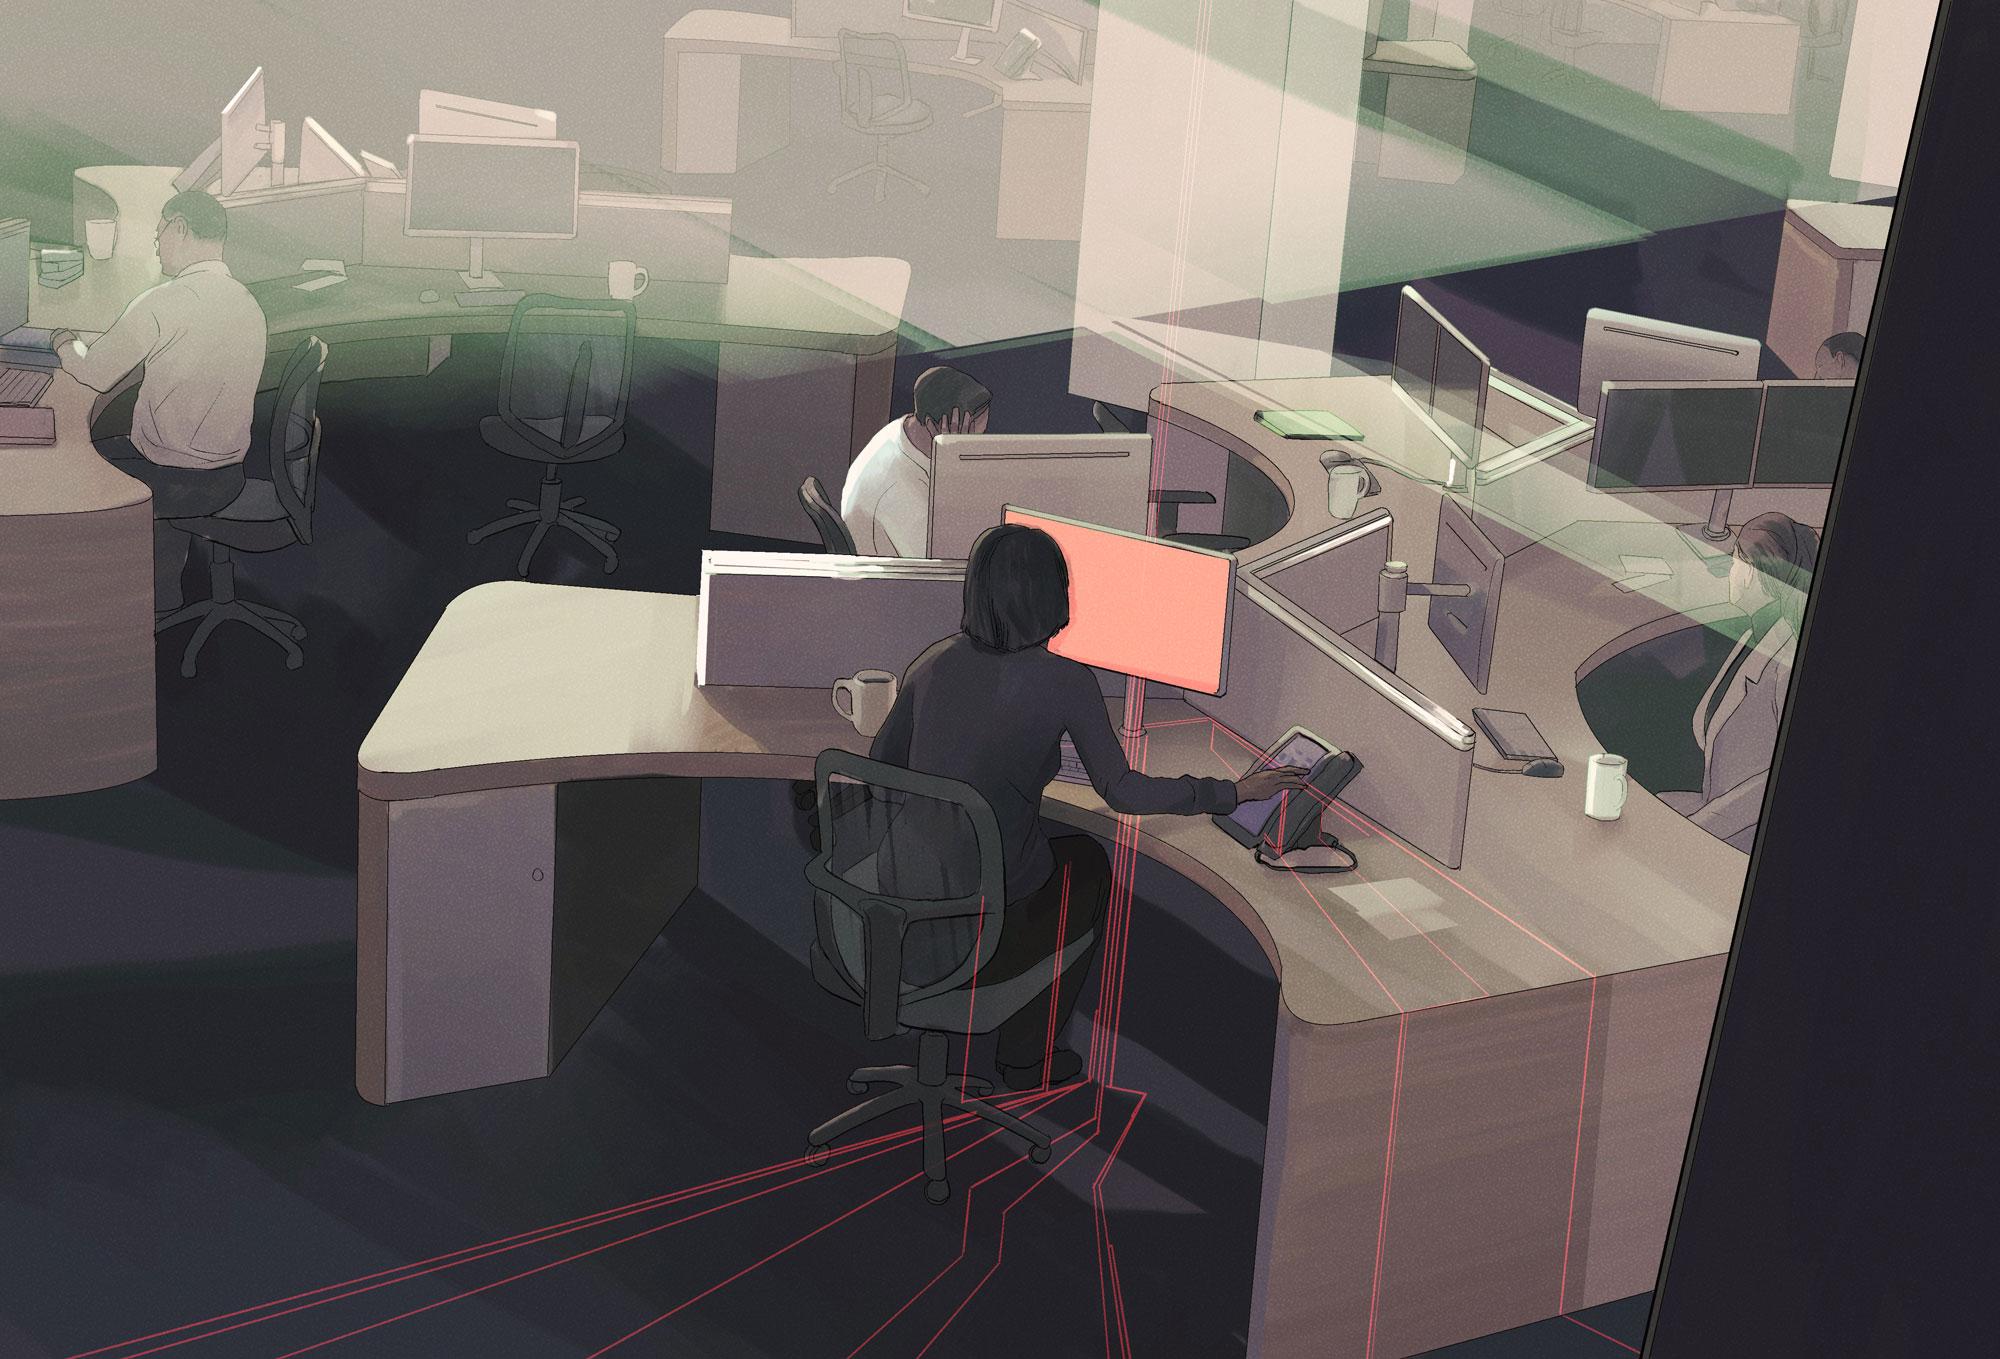 TheIntercept_Surveillance_Office_Fin02B_web-1564422780